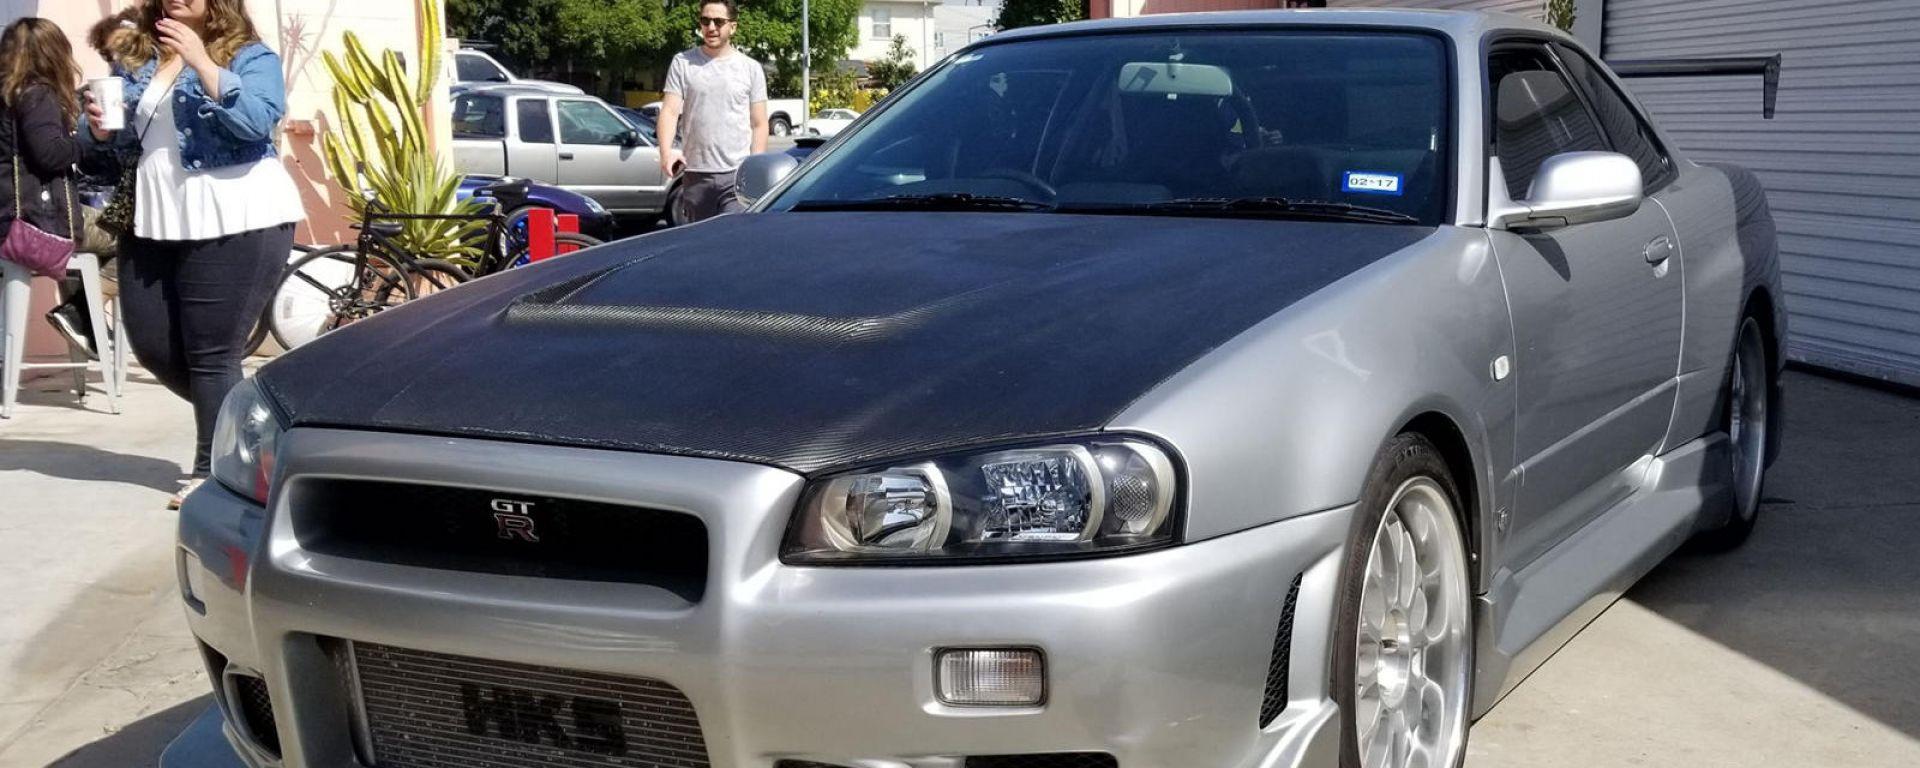 La Nissan Skyline che fu di Paul Walker, protagonista di Fast and Furious